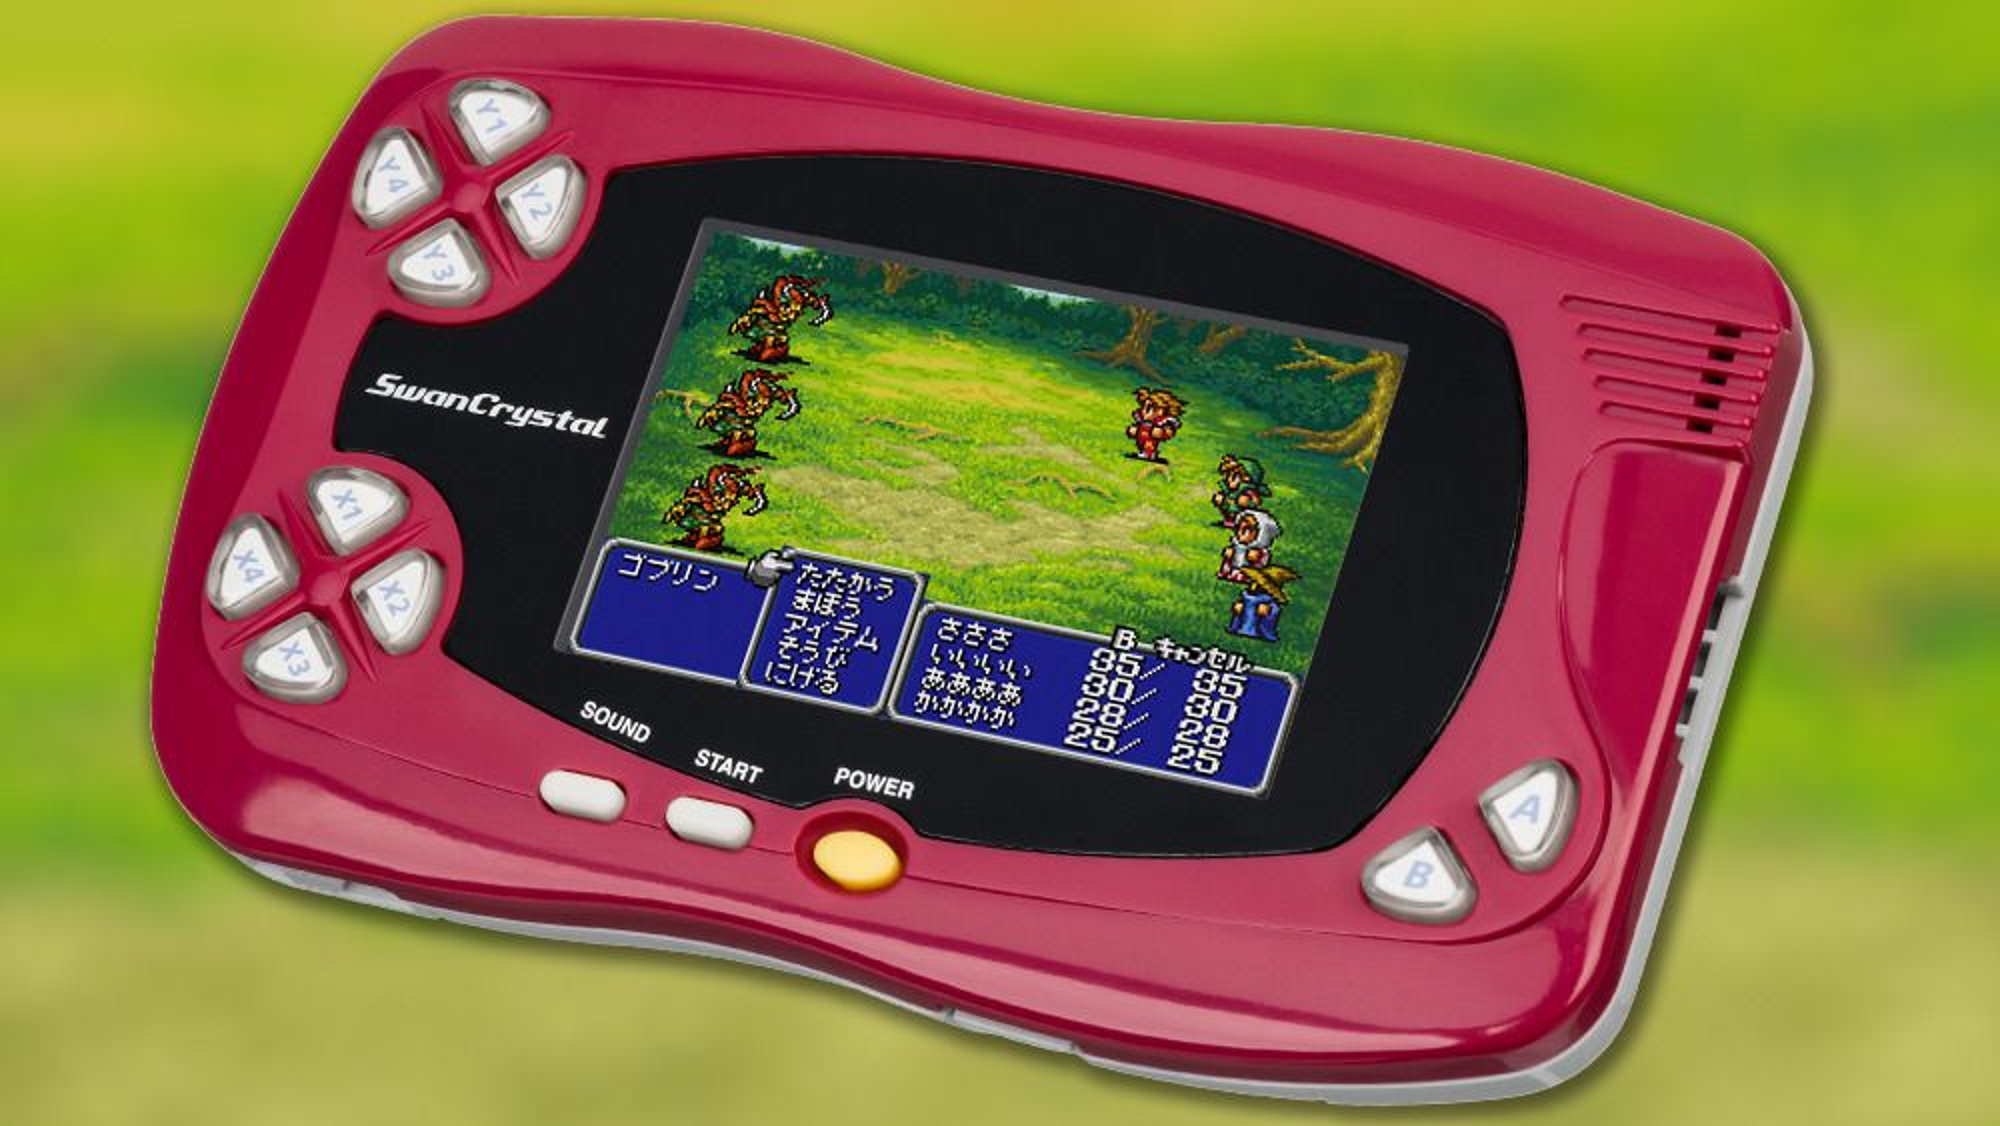 FEATURE: Visste du at Bandai prøvde å overgå Game Boy?